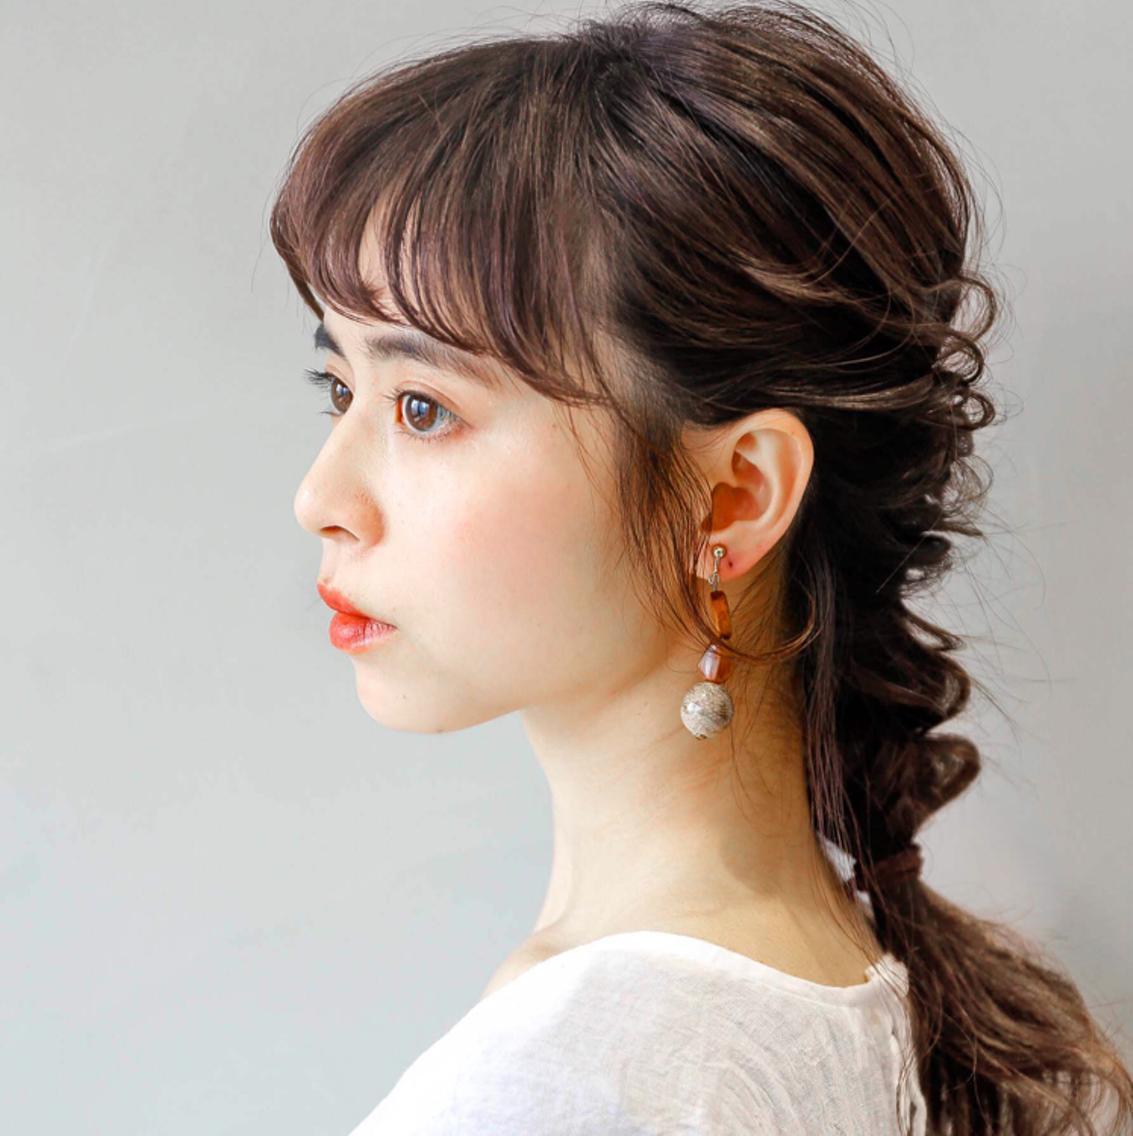 ✩⃛ HOTPEPPER BeautyAward ベストサロン GOLD Prize受賞店 ✩⃛    :::  ❁ 最大50%off ❁ :::